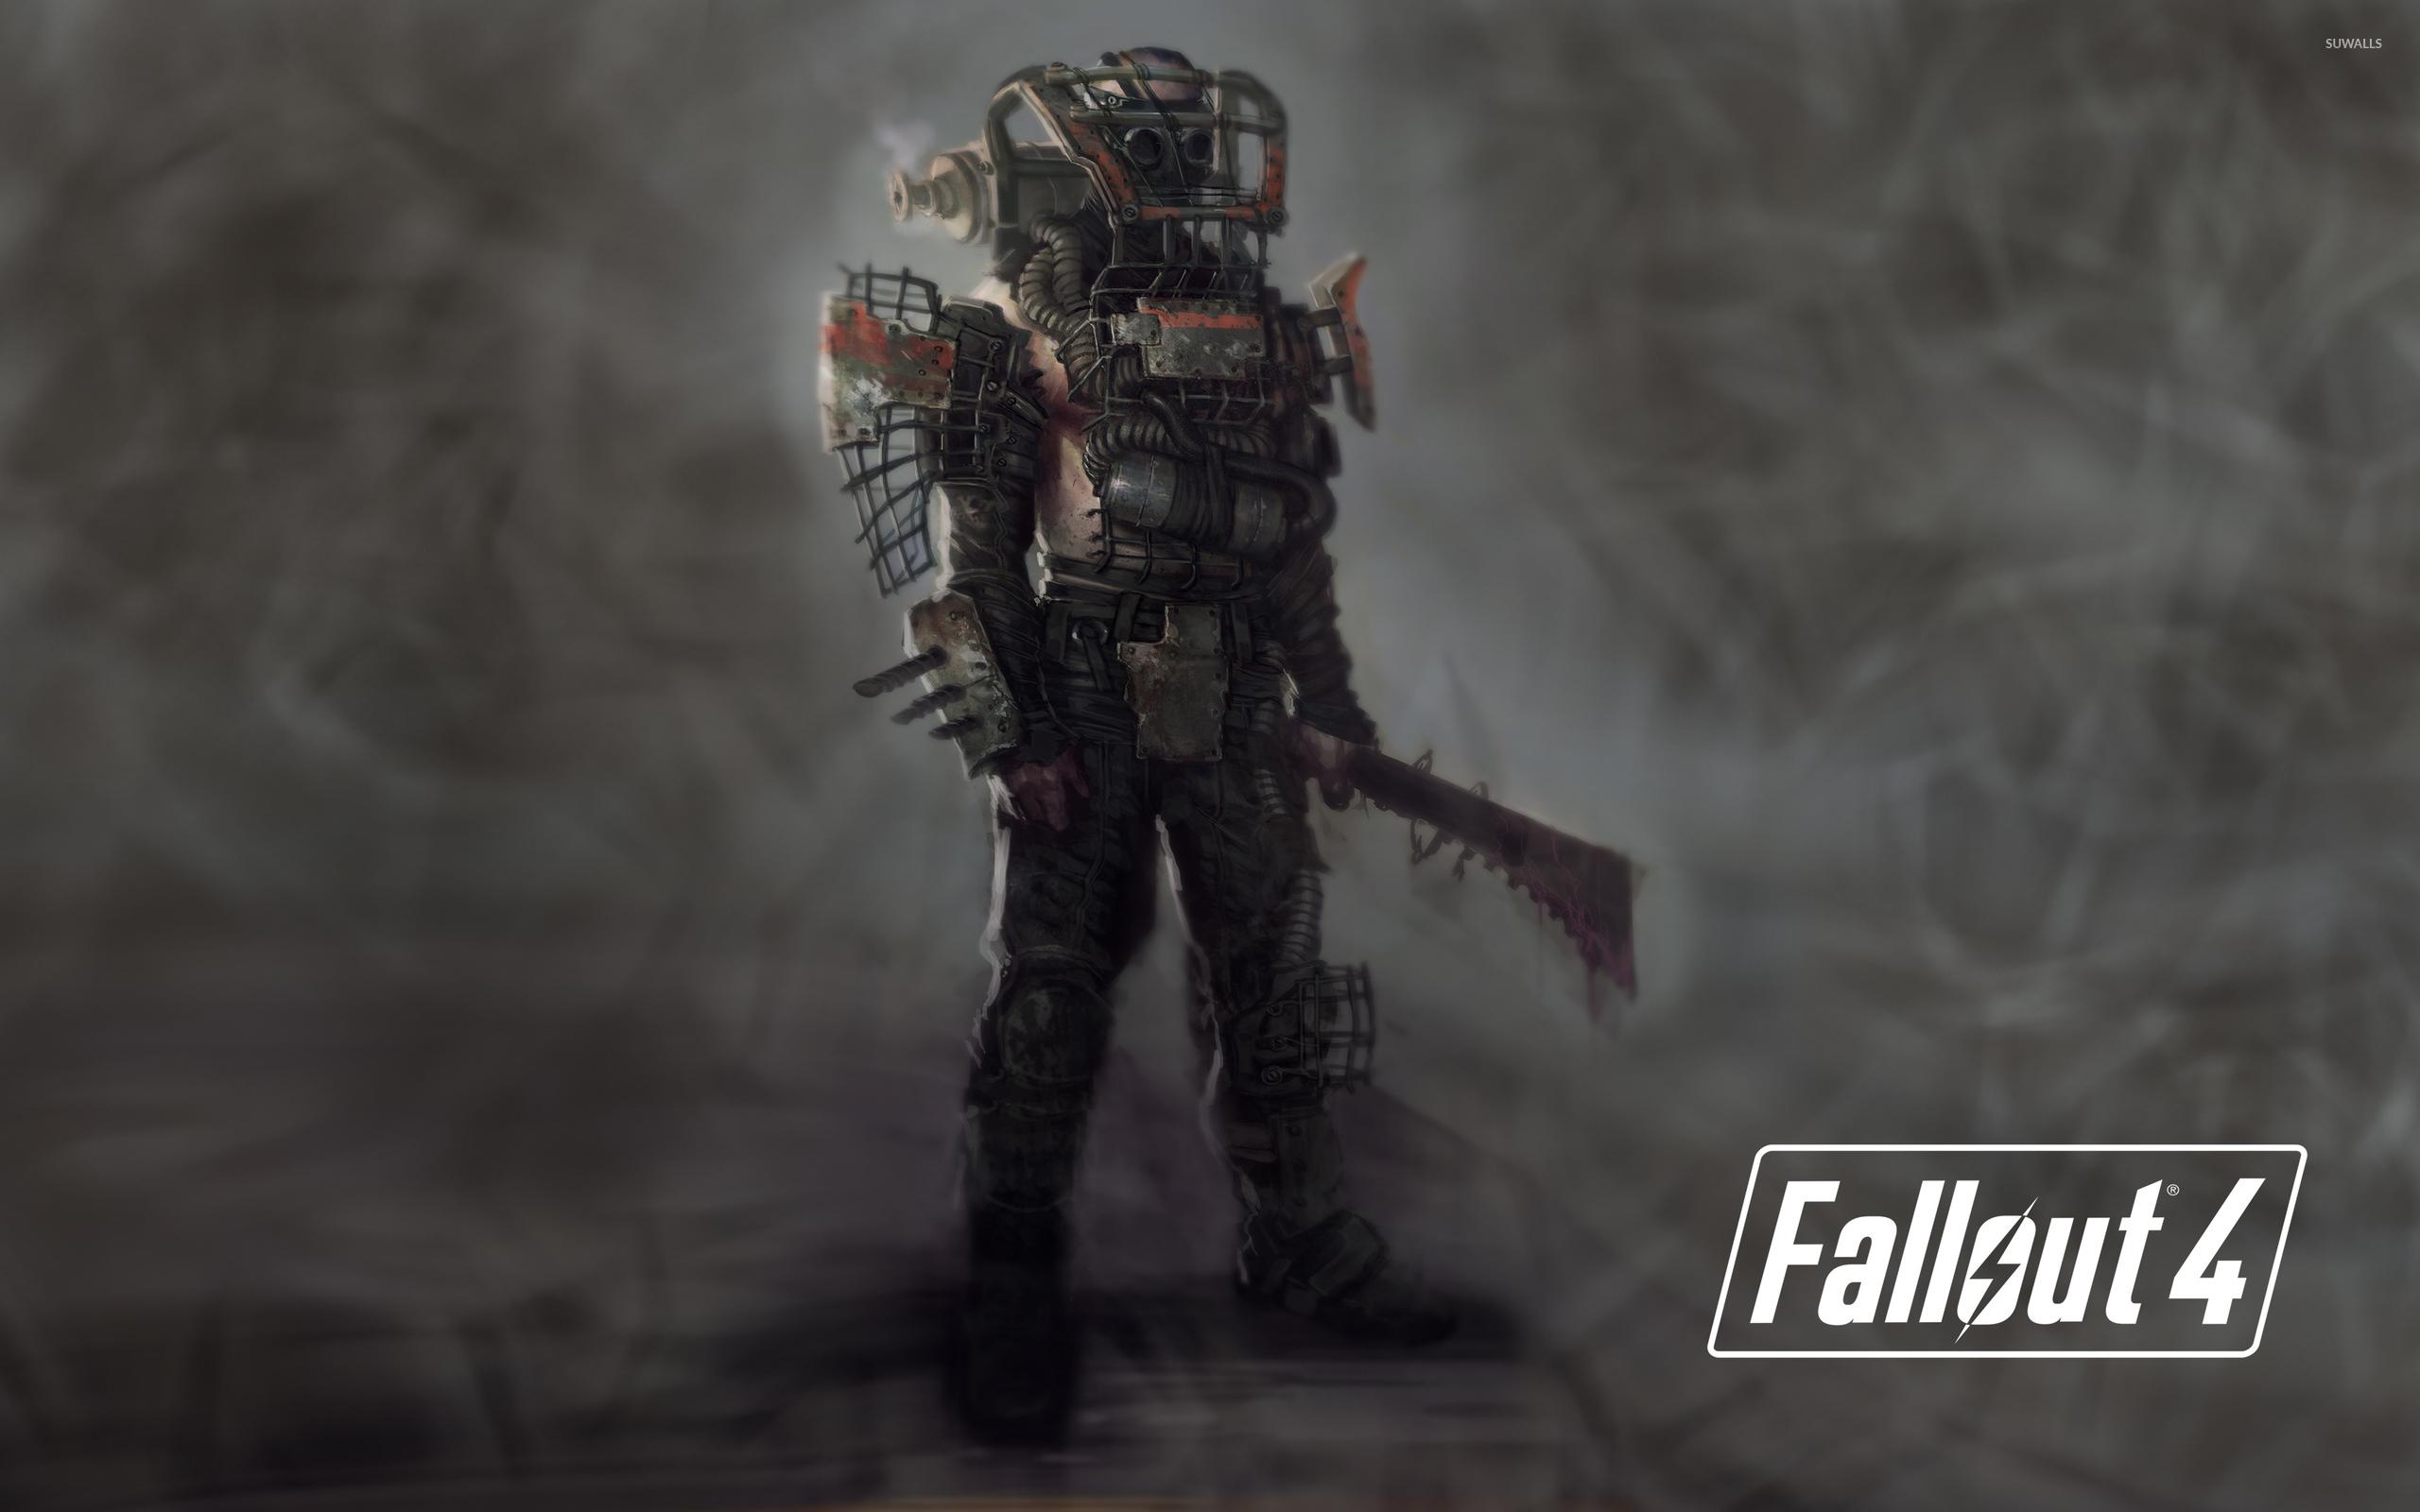 Raider In Fallout 4 Wallpaper